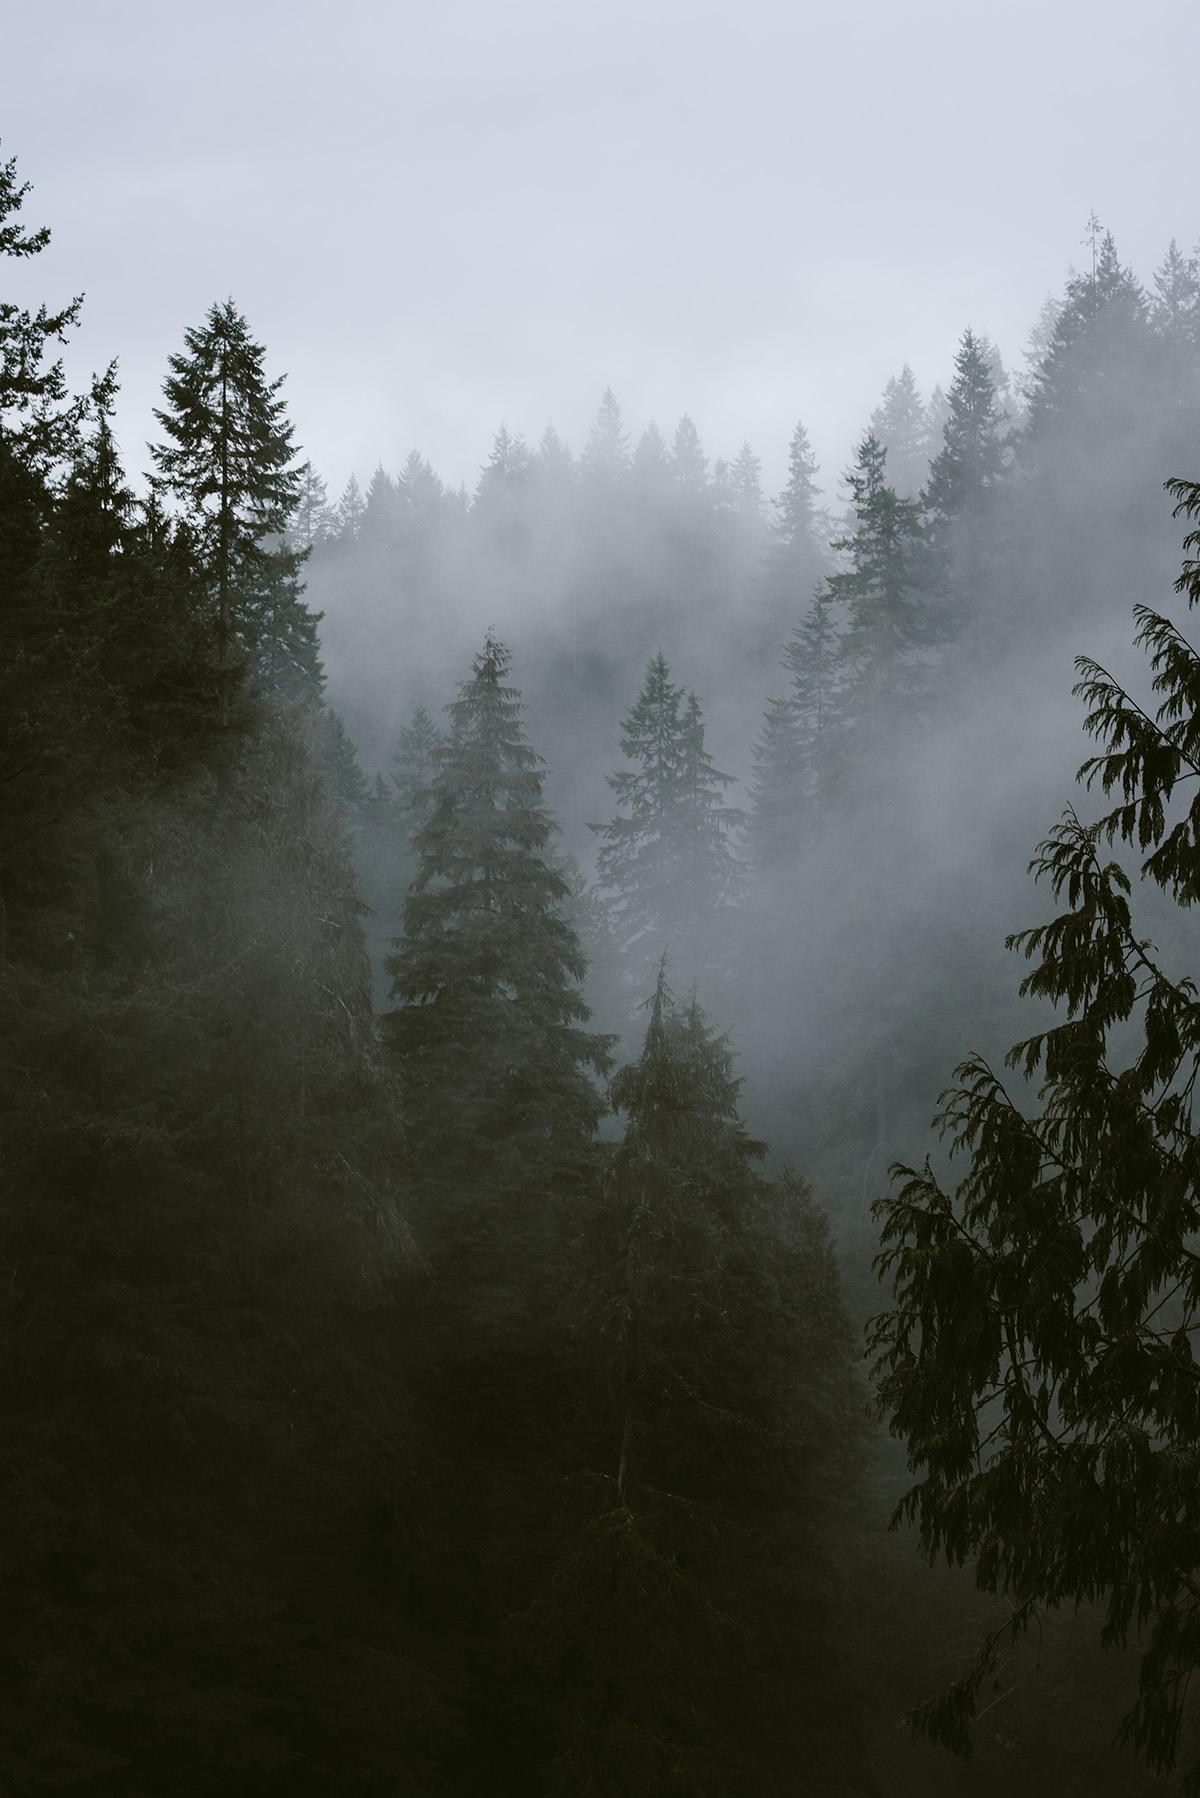 vancouver capilano foggy trees